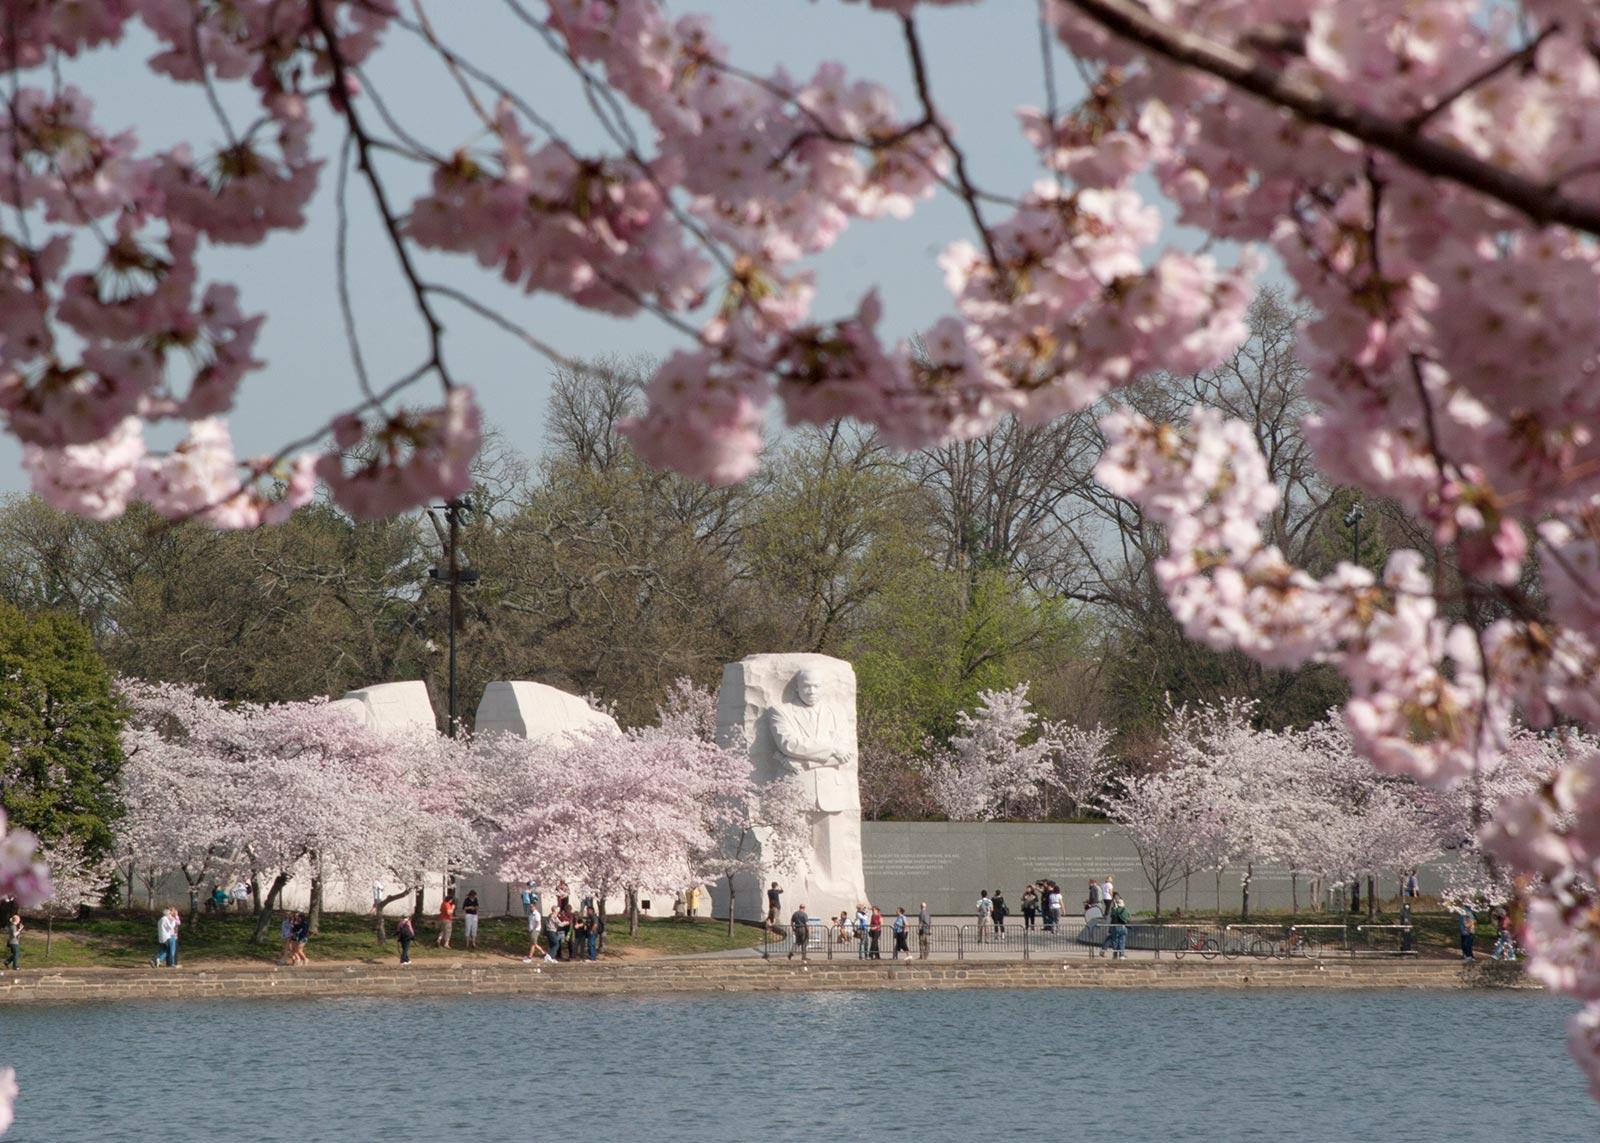 Martin Luther King, Jr. National Memorial 1